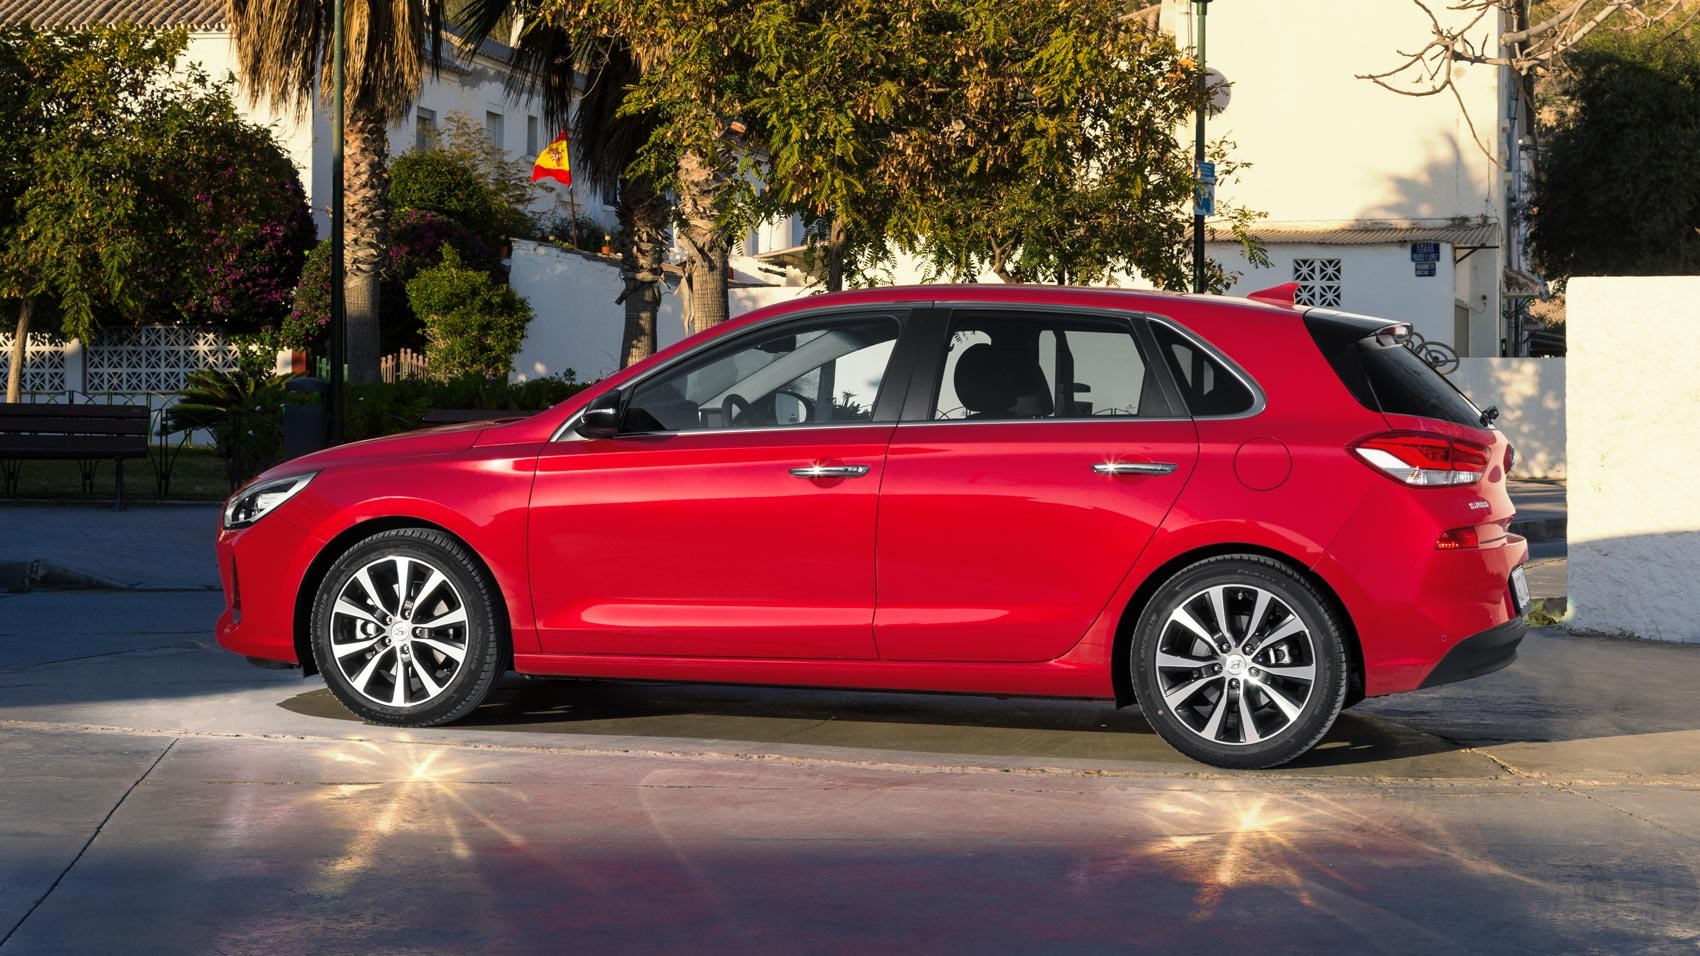 Hyundai Lease Deals >> Hyundai i30 1.4 T-GDi 140PS Premium (2017) review by CAR ...